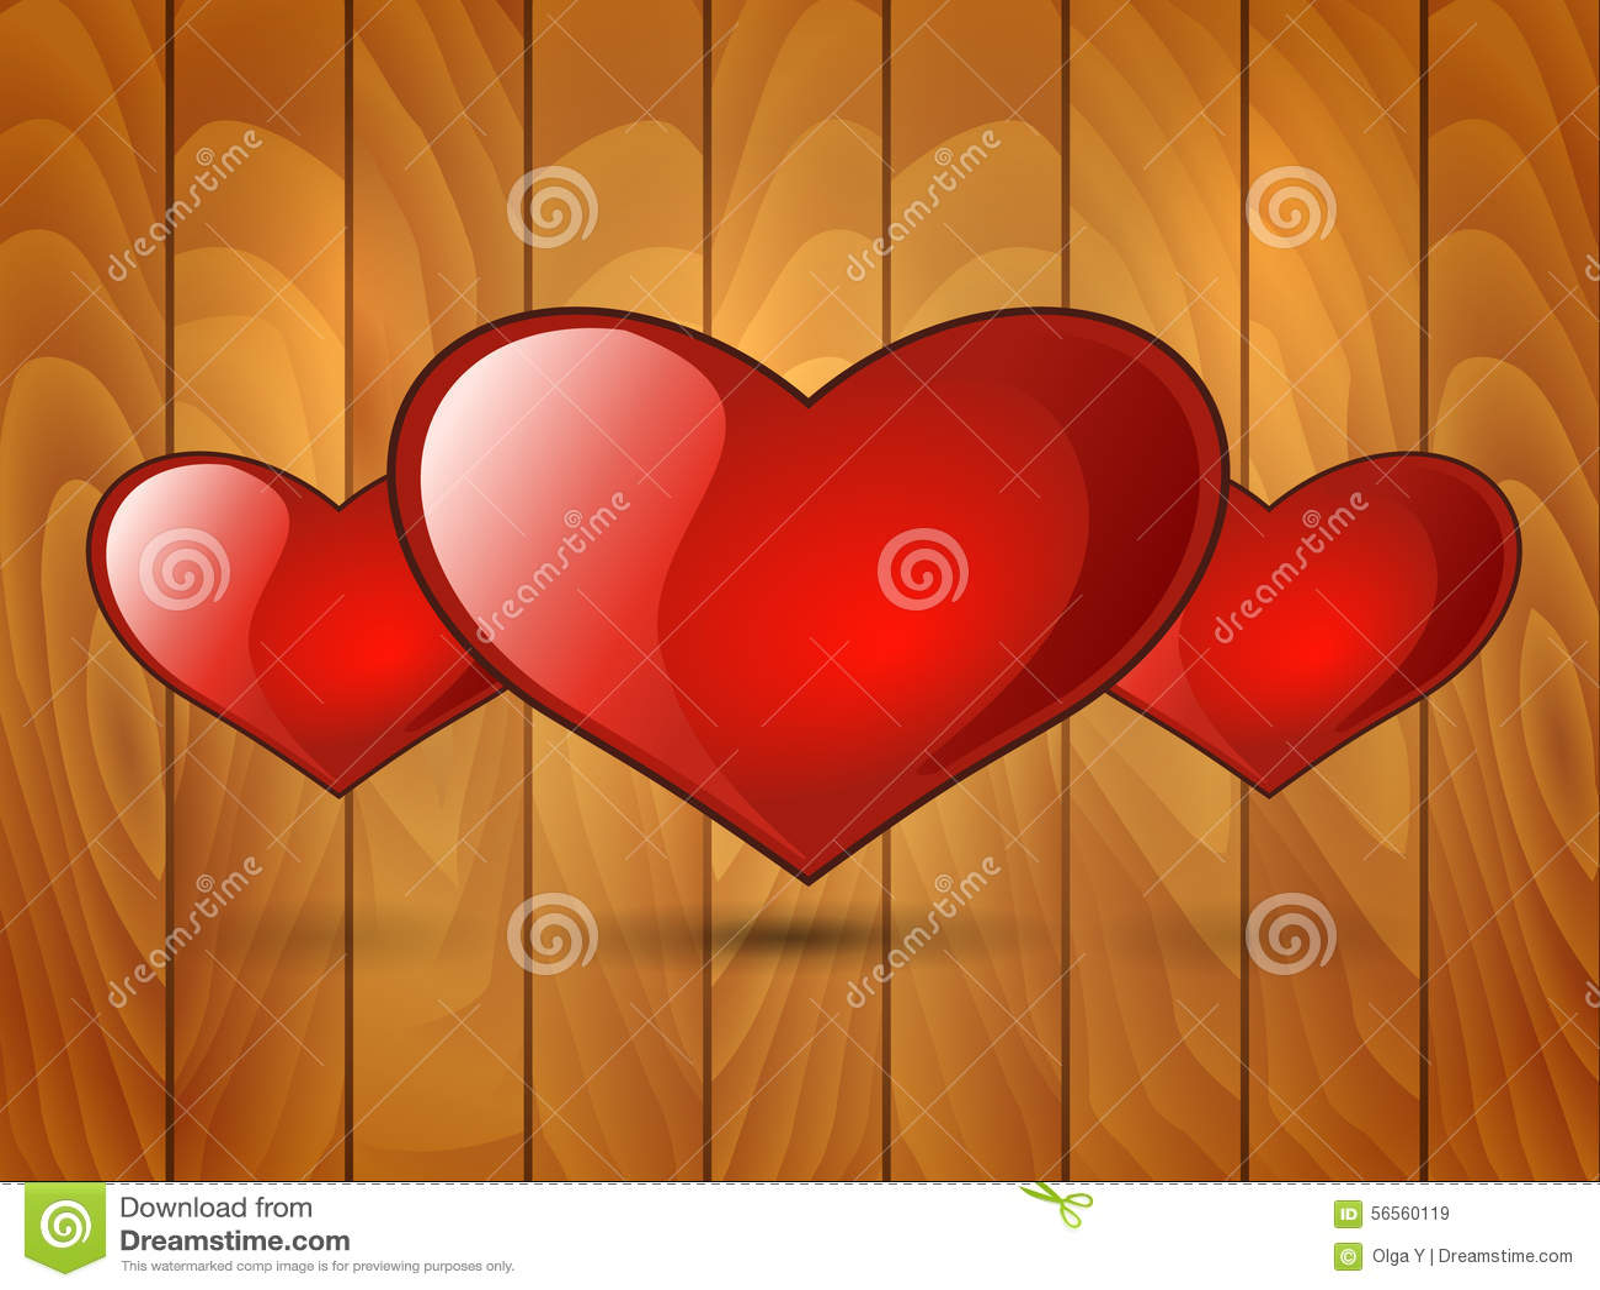 Download Κόκκινη στιλπνή καρδιά τρία σε ένα ξύλινο υπόβαθρο Διανυσματική απεικόνιση - εικονογραφία από αδελφών, διάνυσμα: 56560119